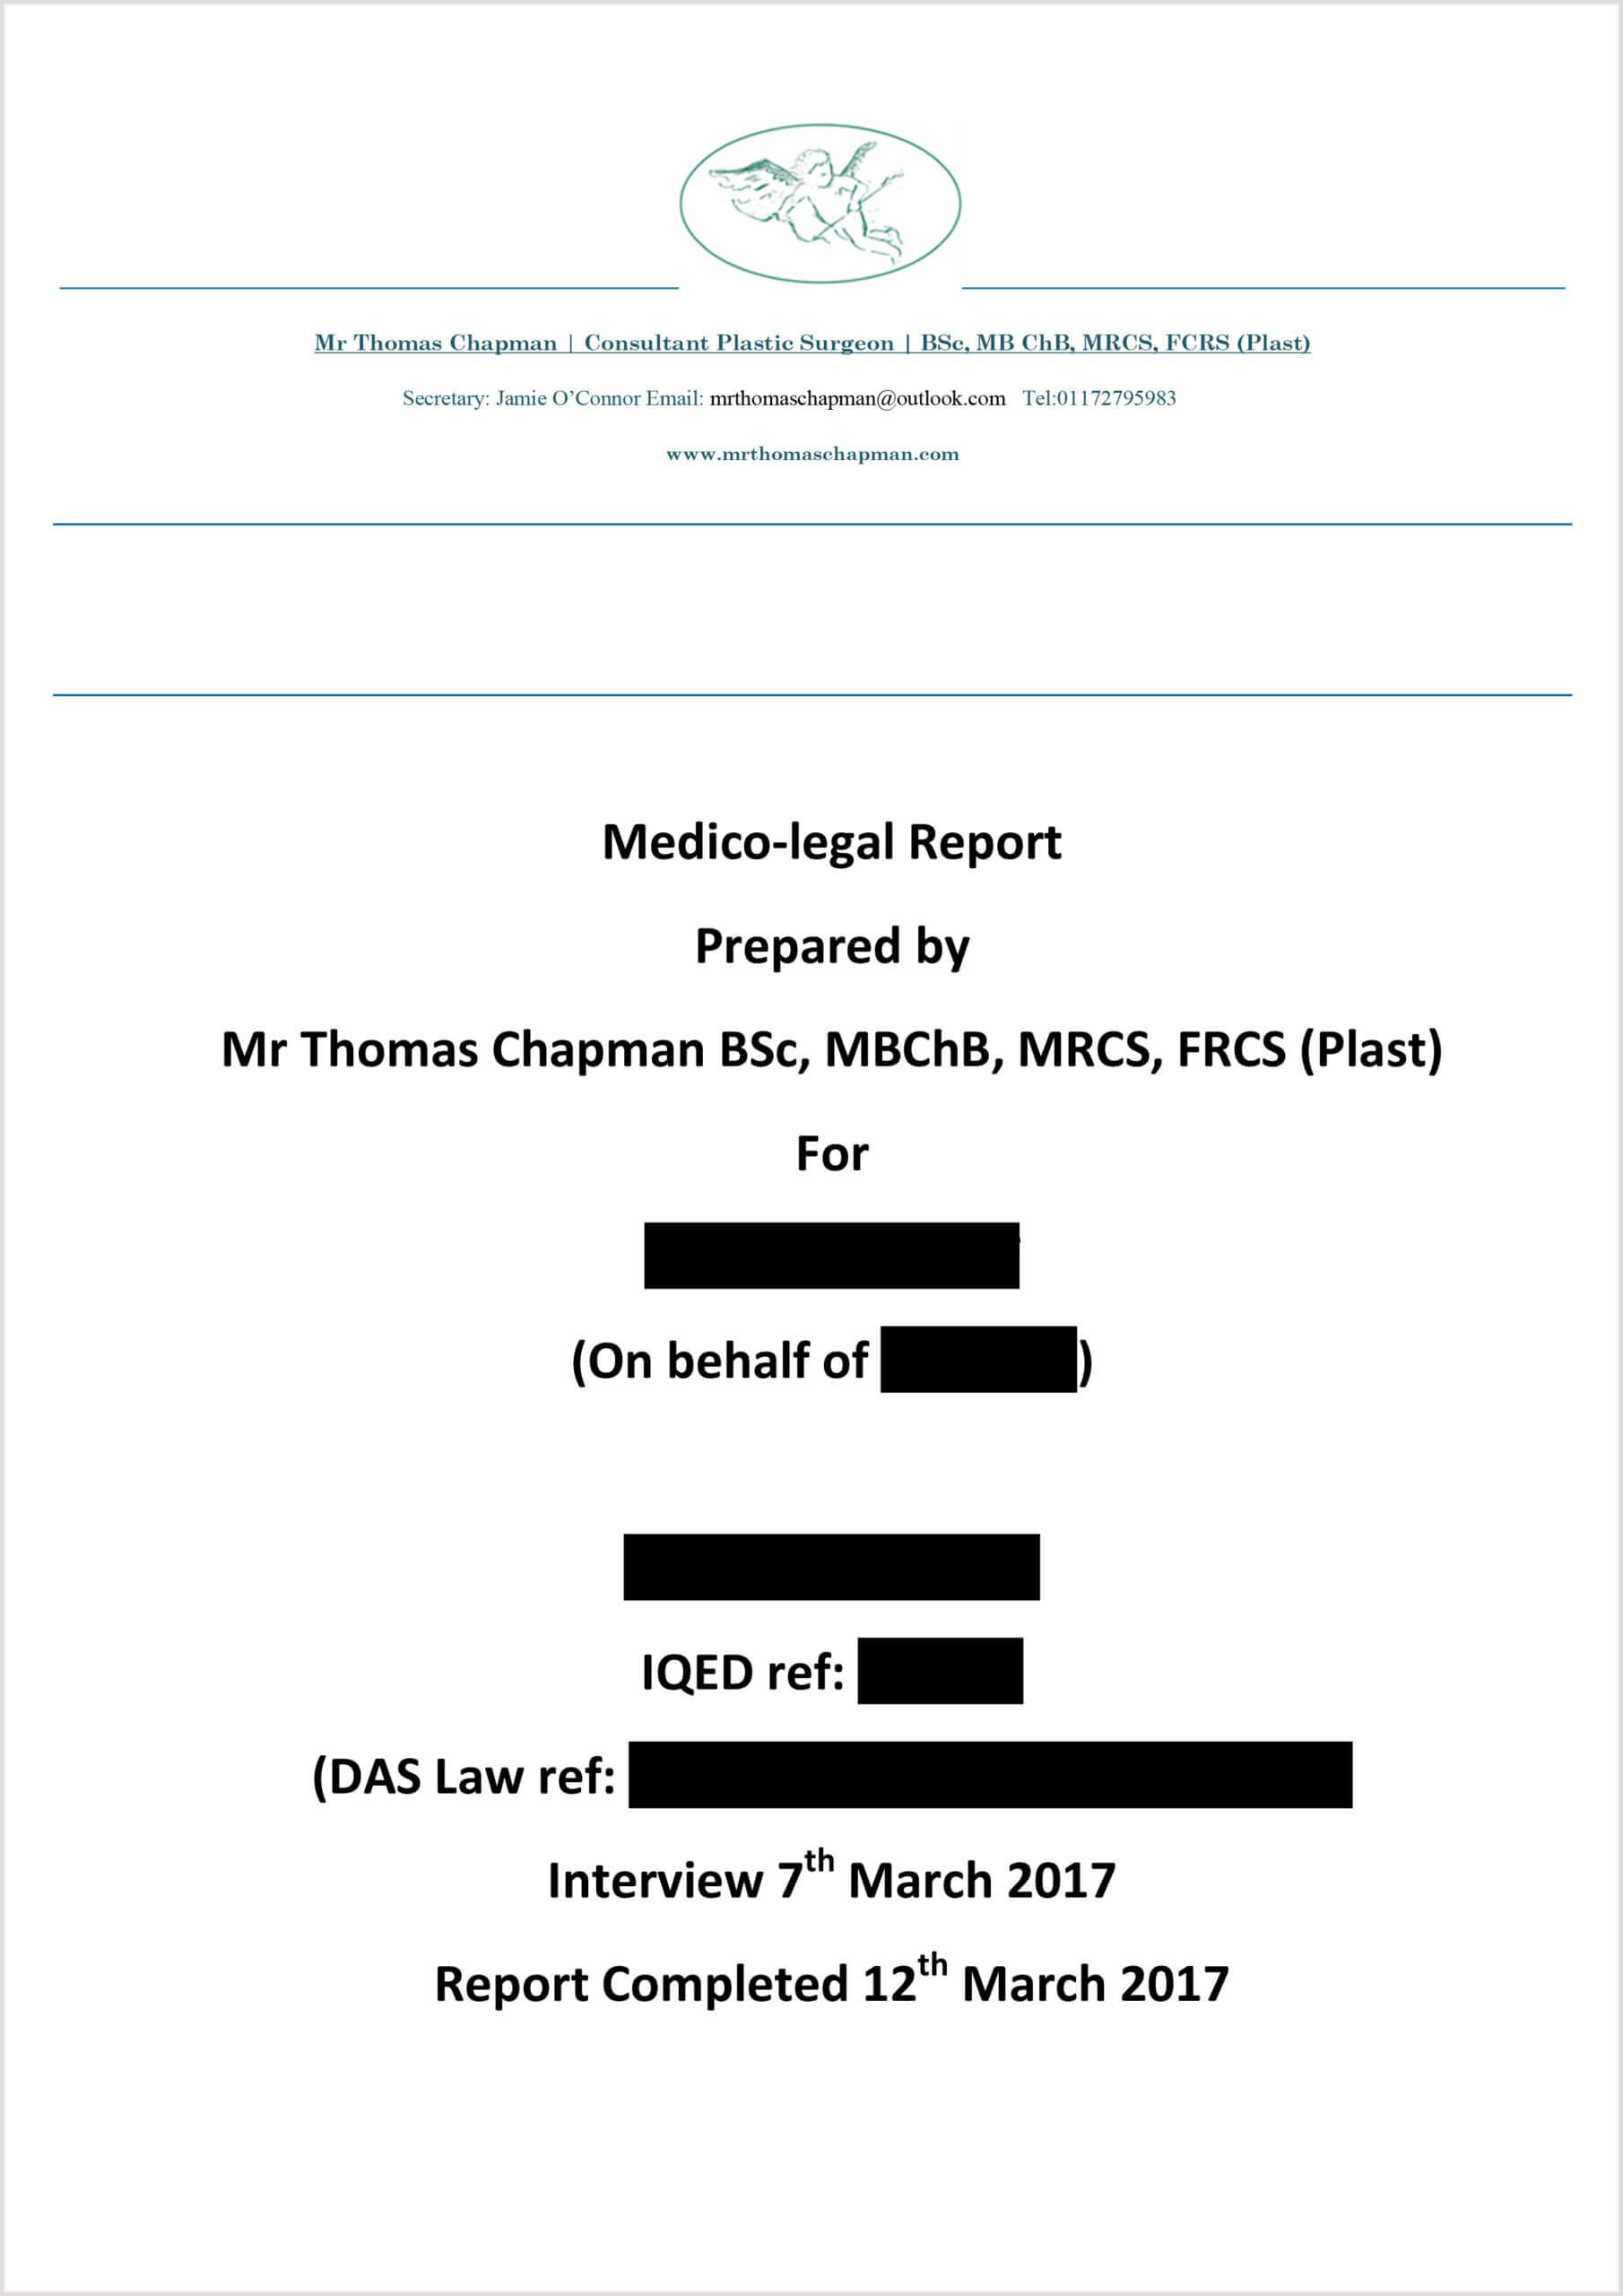 Medicolegal Reporting – Mr Thomas Chapman Throughout Expert Witness Report Template